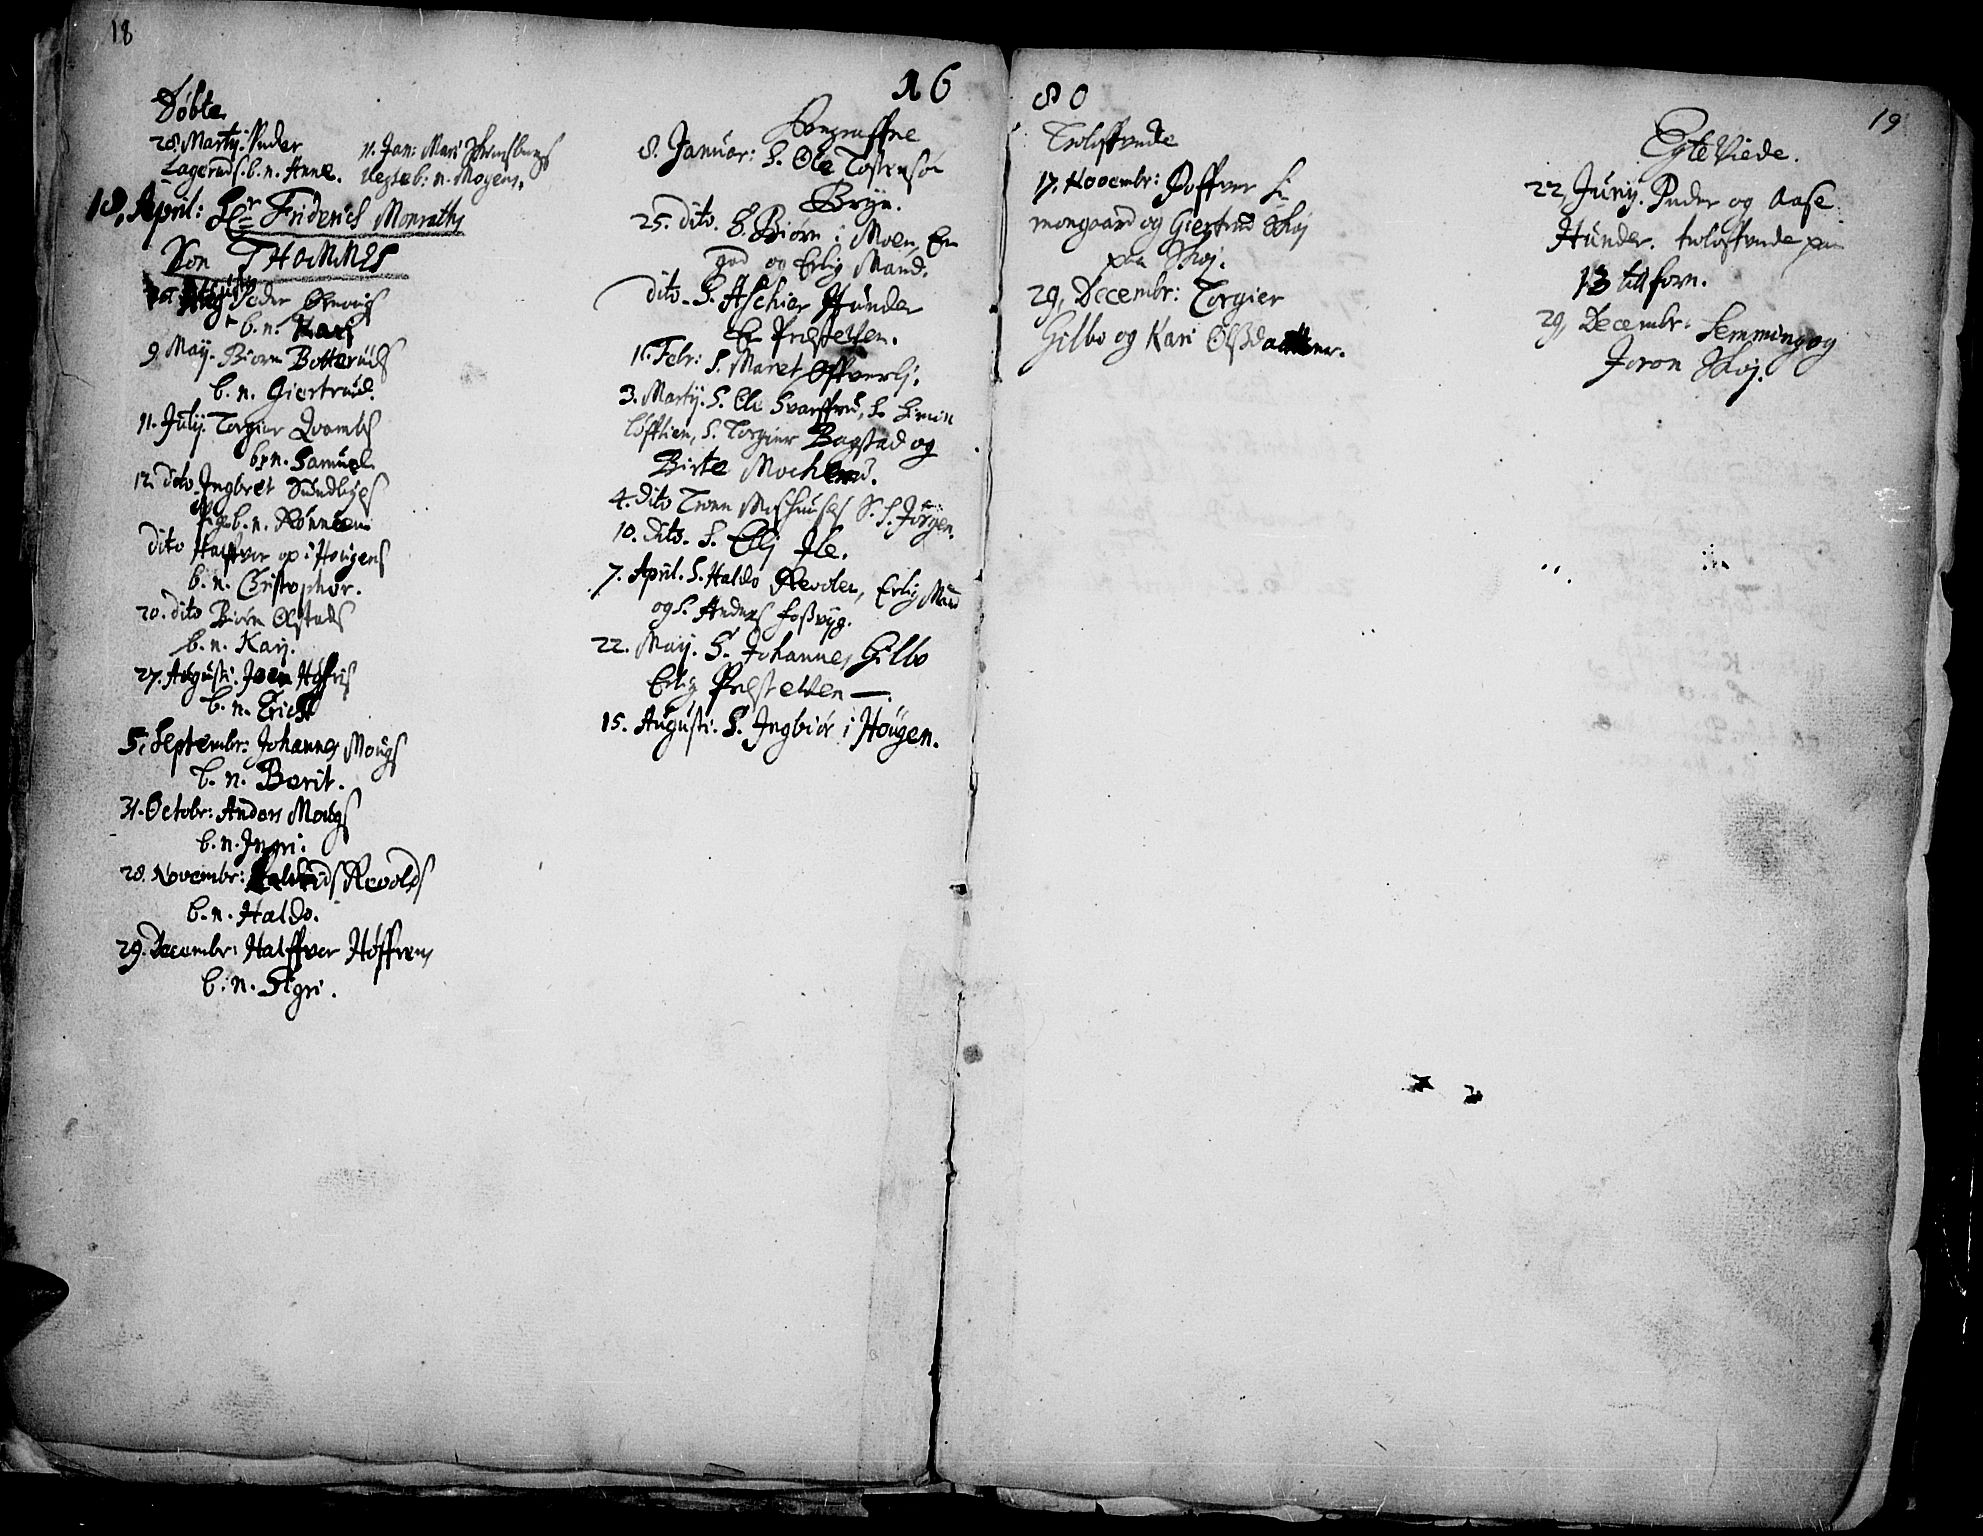 SAH, Øyer prestekontor, Ministerialbok nr. 1, 1671-1727, s. 18-19